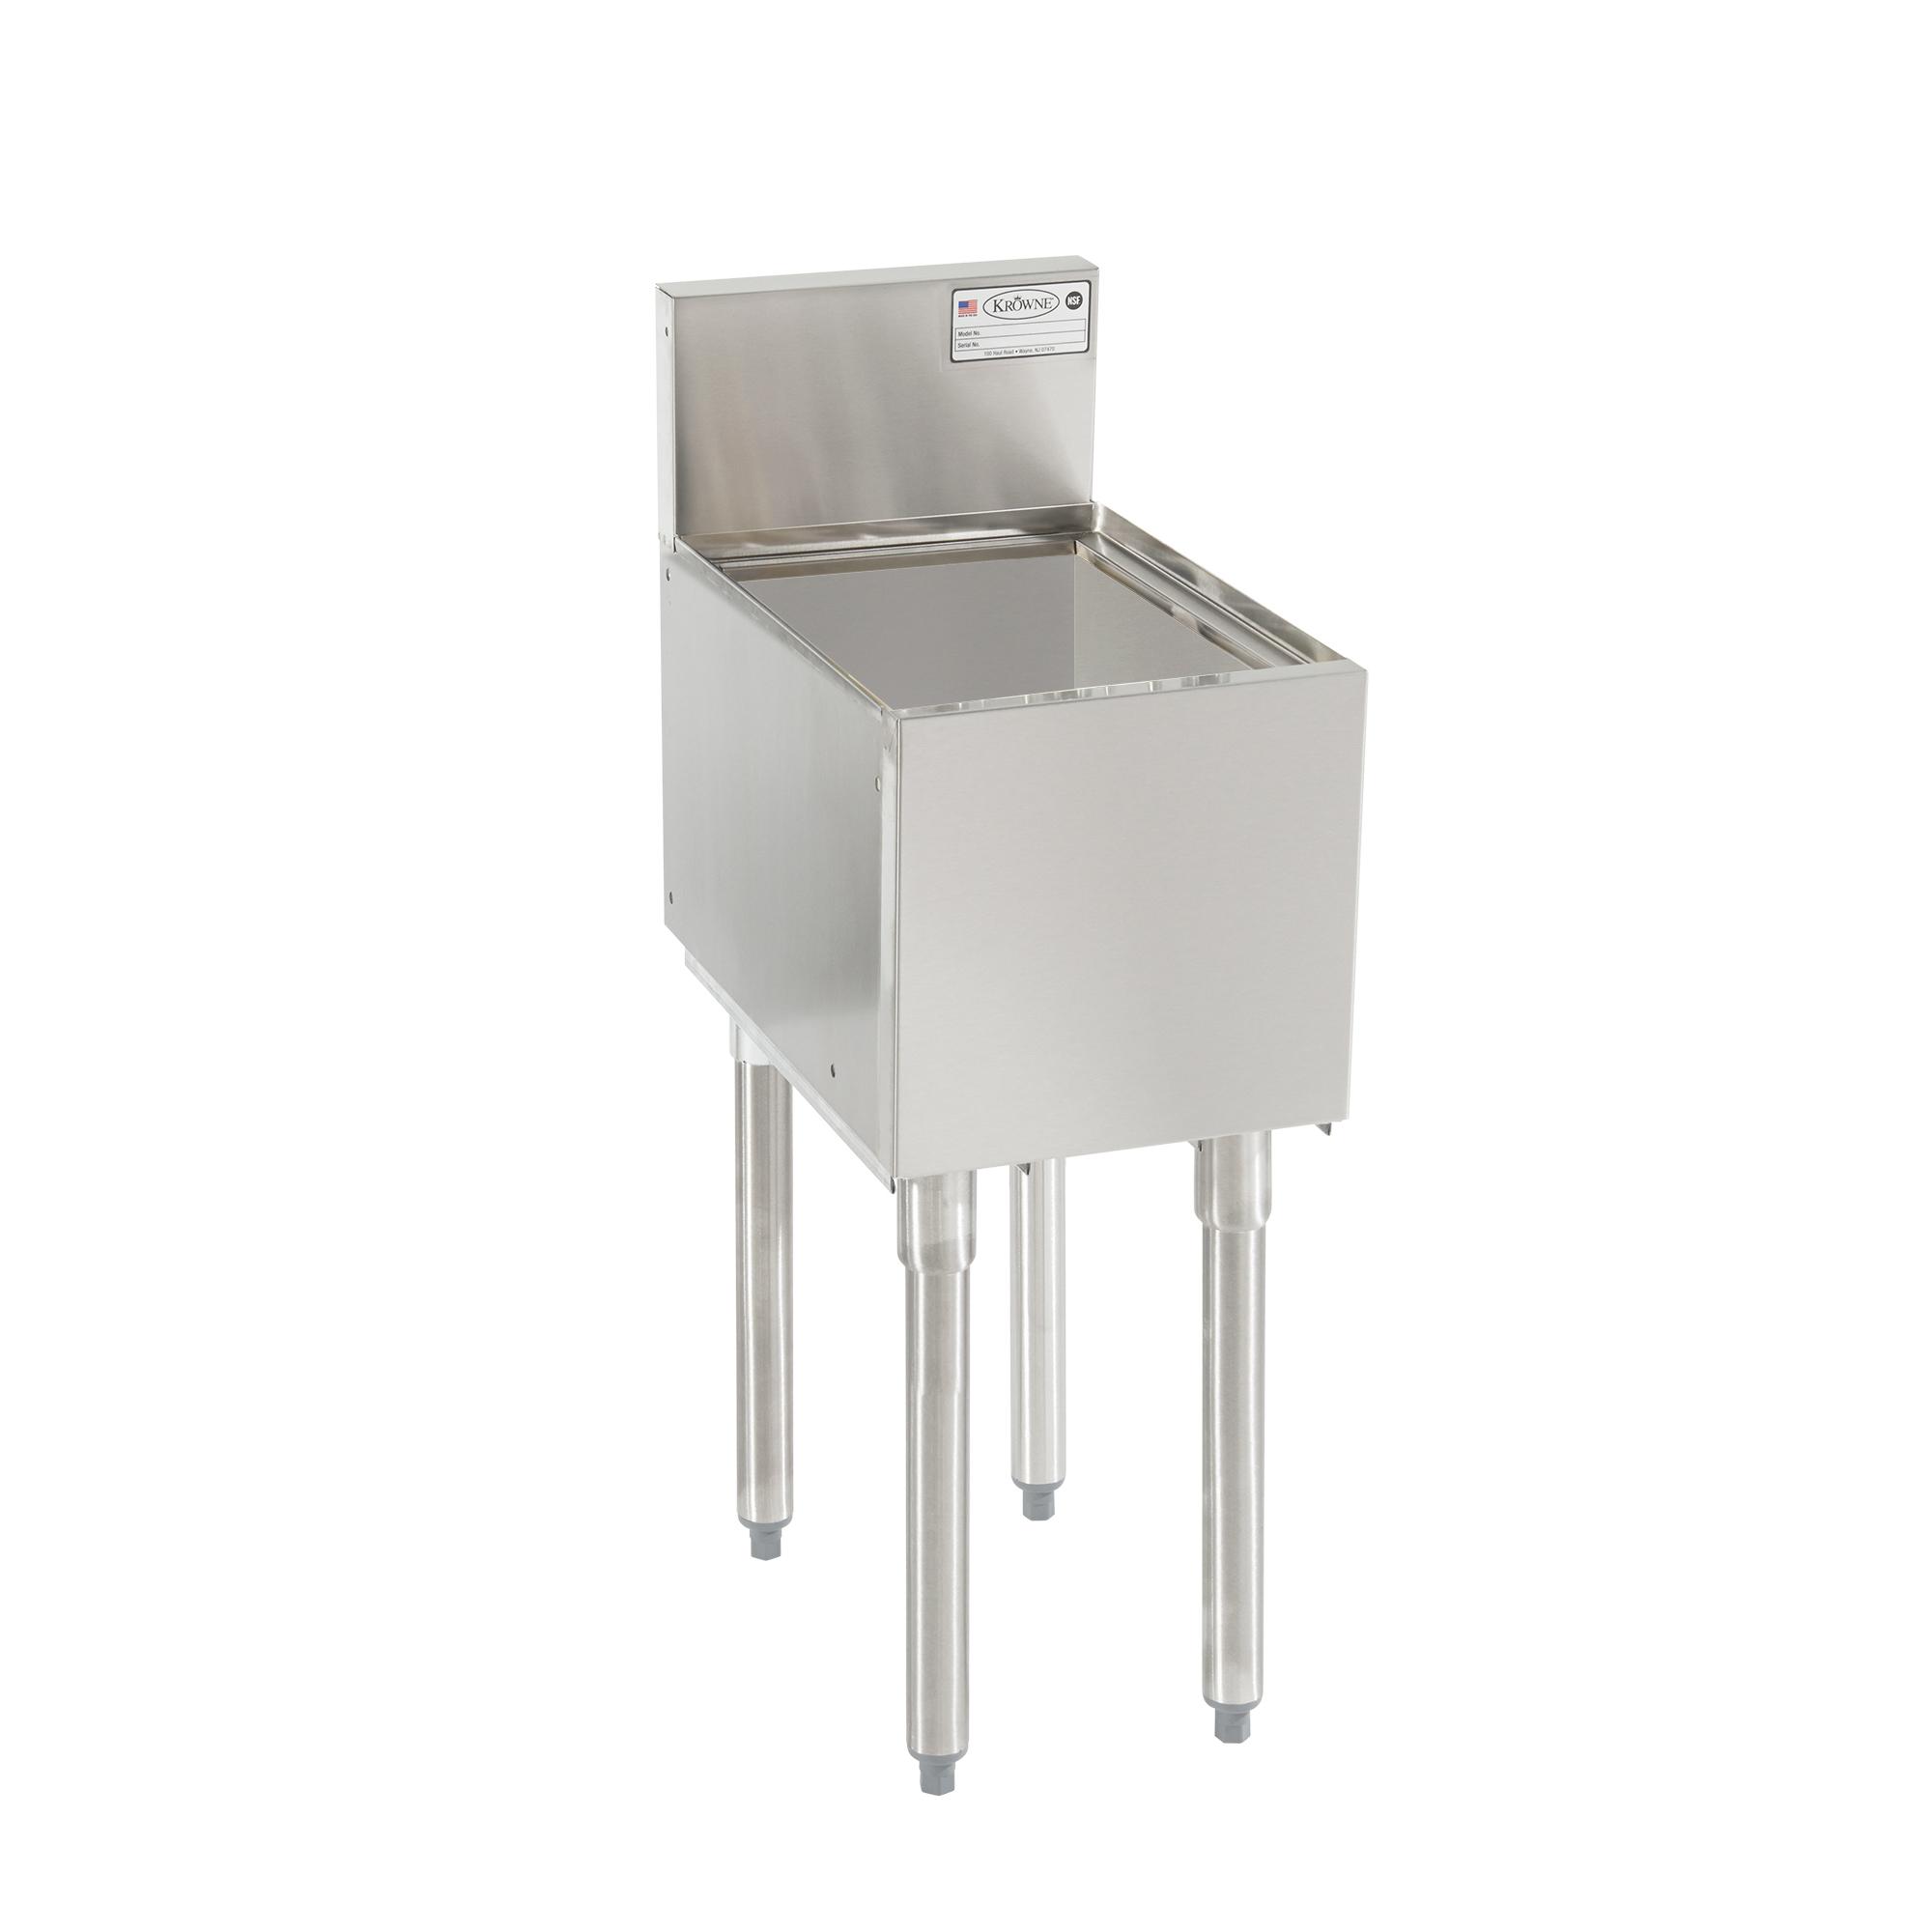 Krowne Metal KR18-12 underbar ice bin/cocktail unit